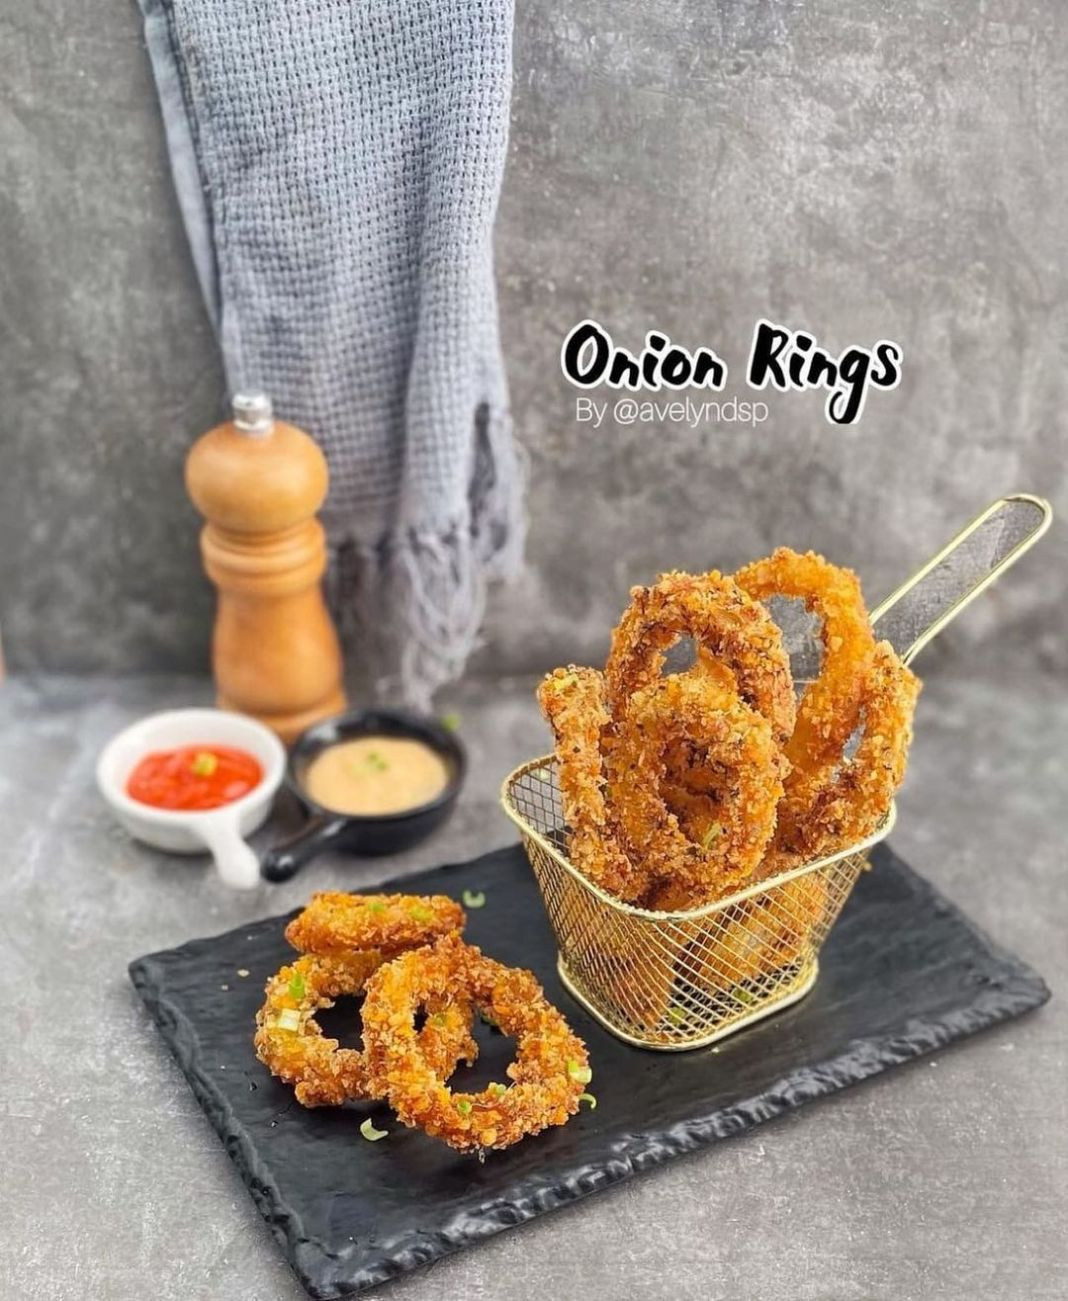 Info kuliner, Bikin onion rings ini gampang-gampang susah disebabkan biasanya kalo udah dingin udah ngga kriuk la…